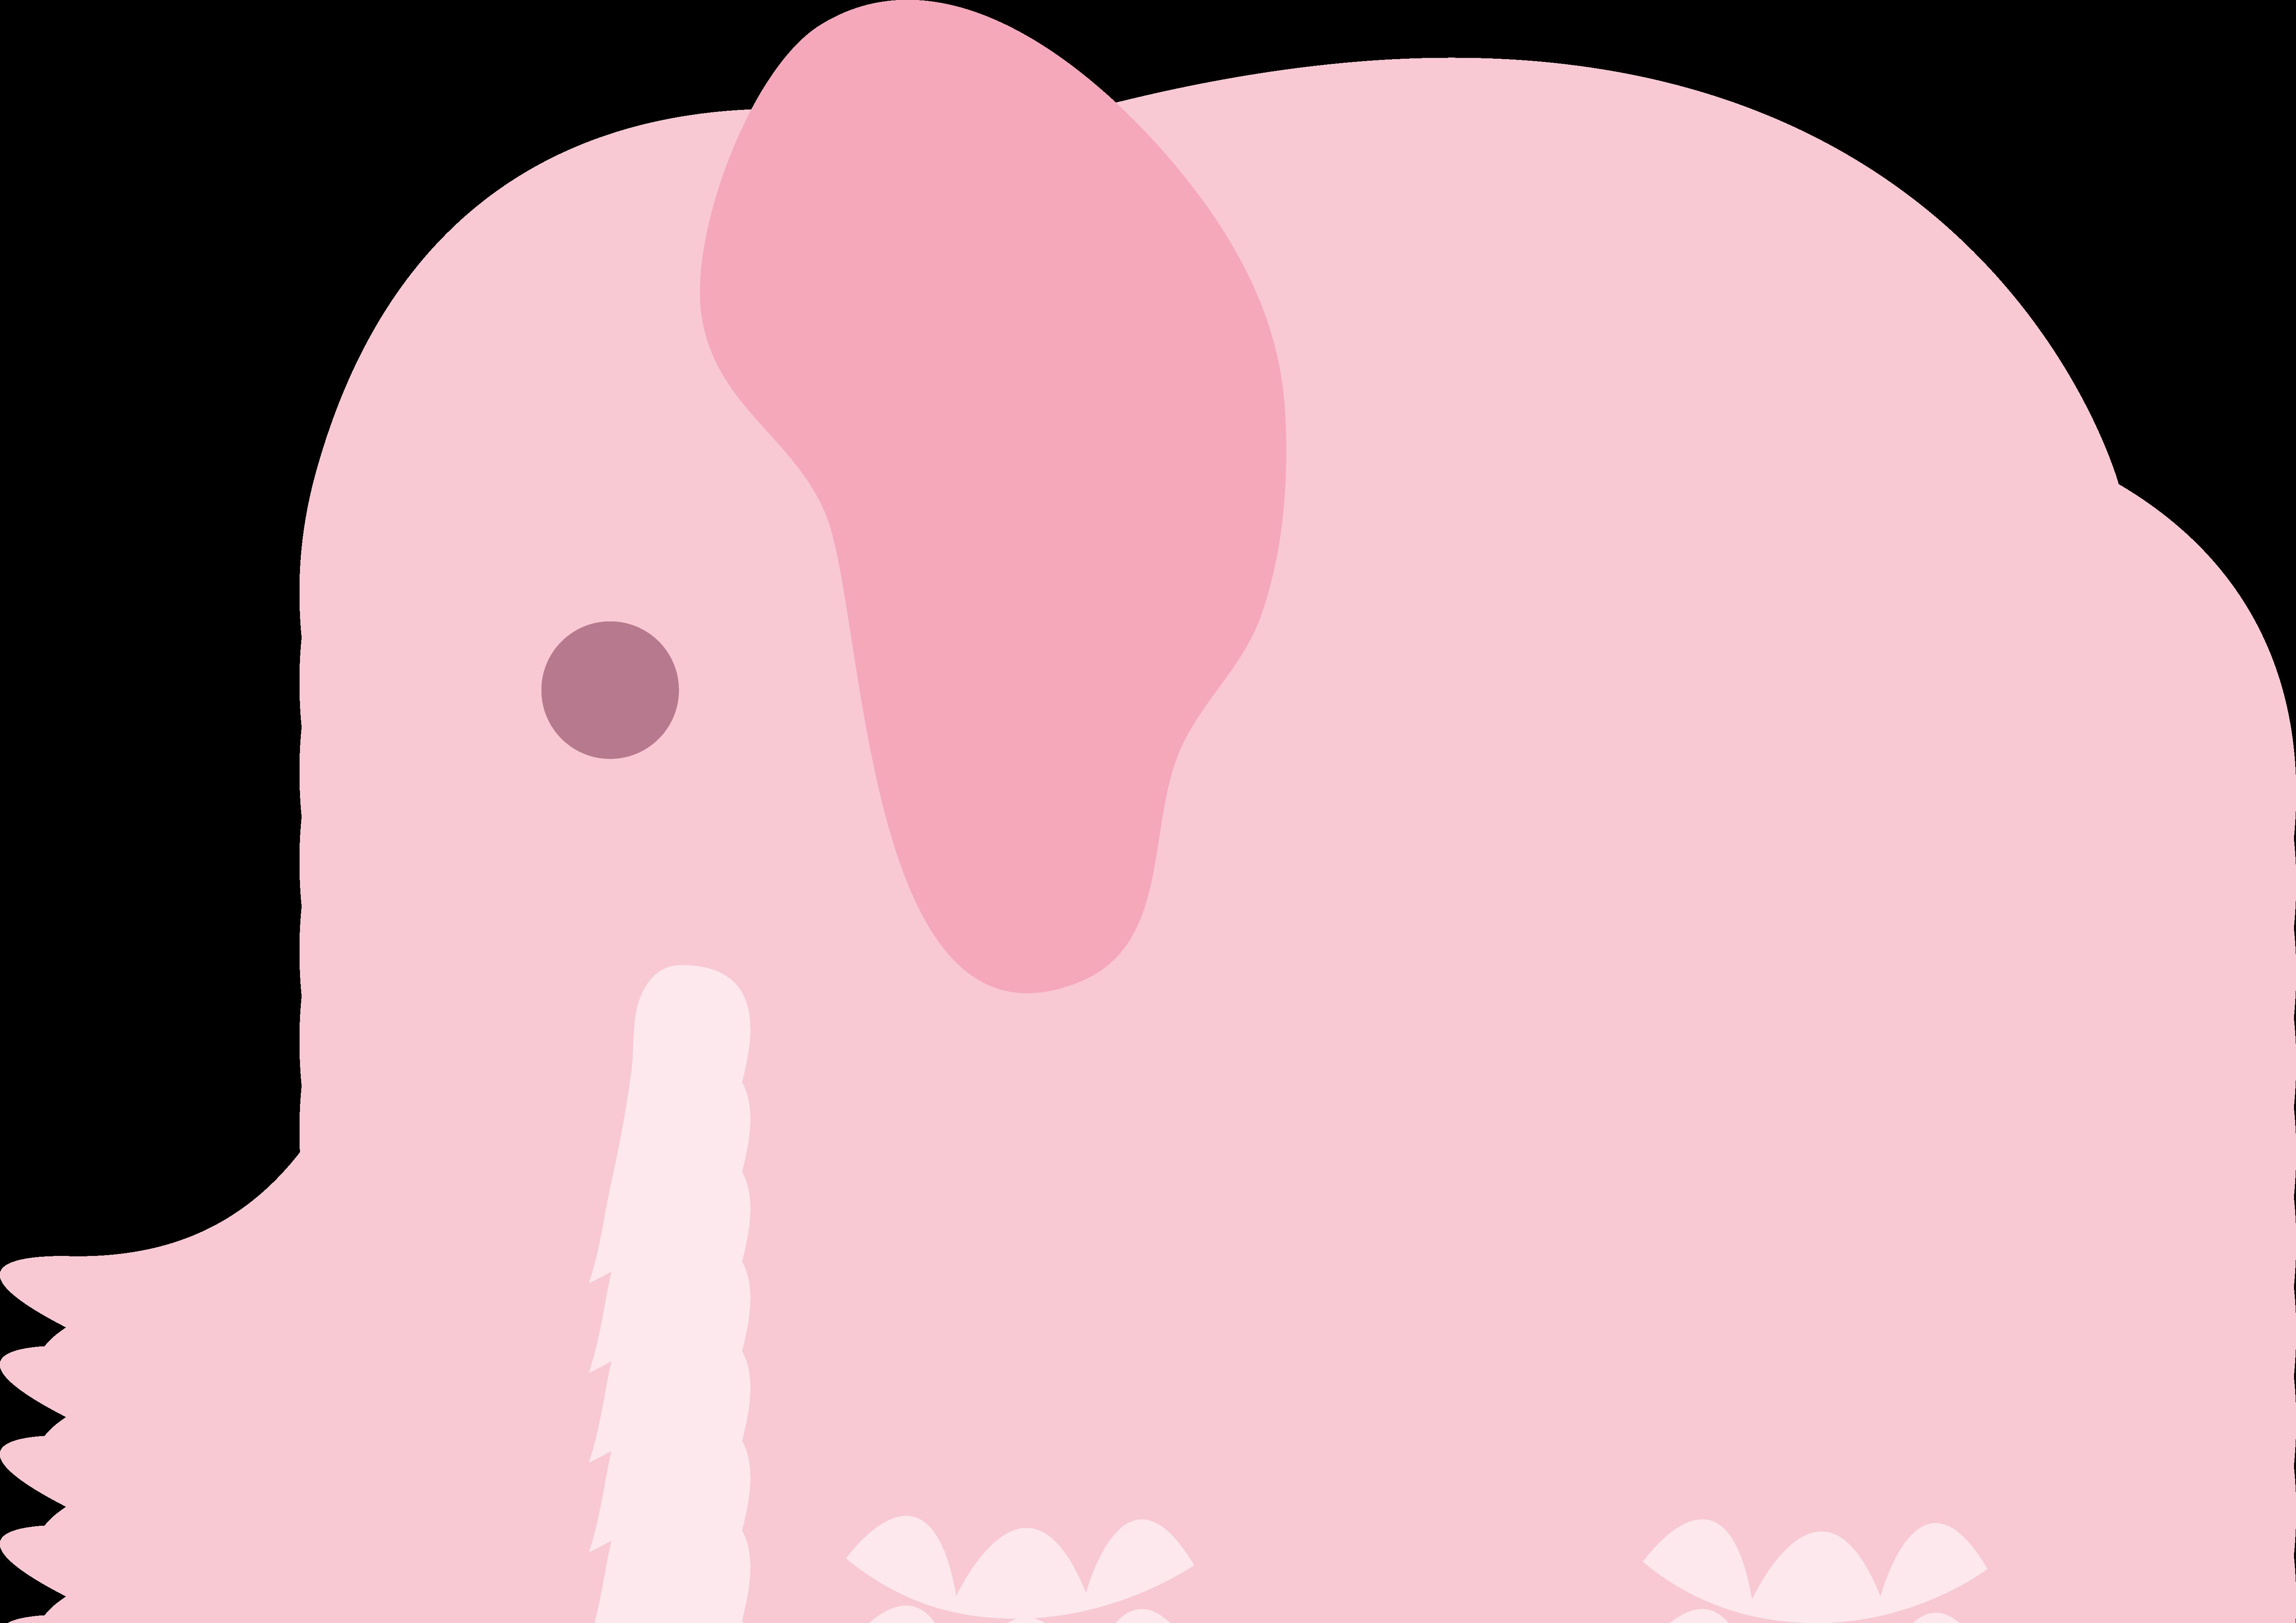 5786x4090 Clip Art Baby Elephant Clip Art